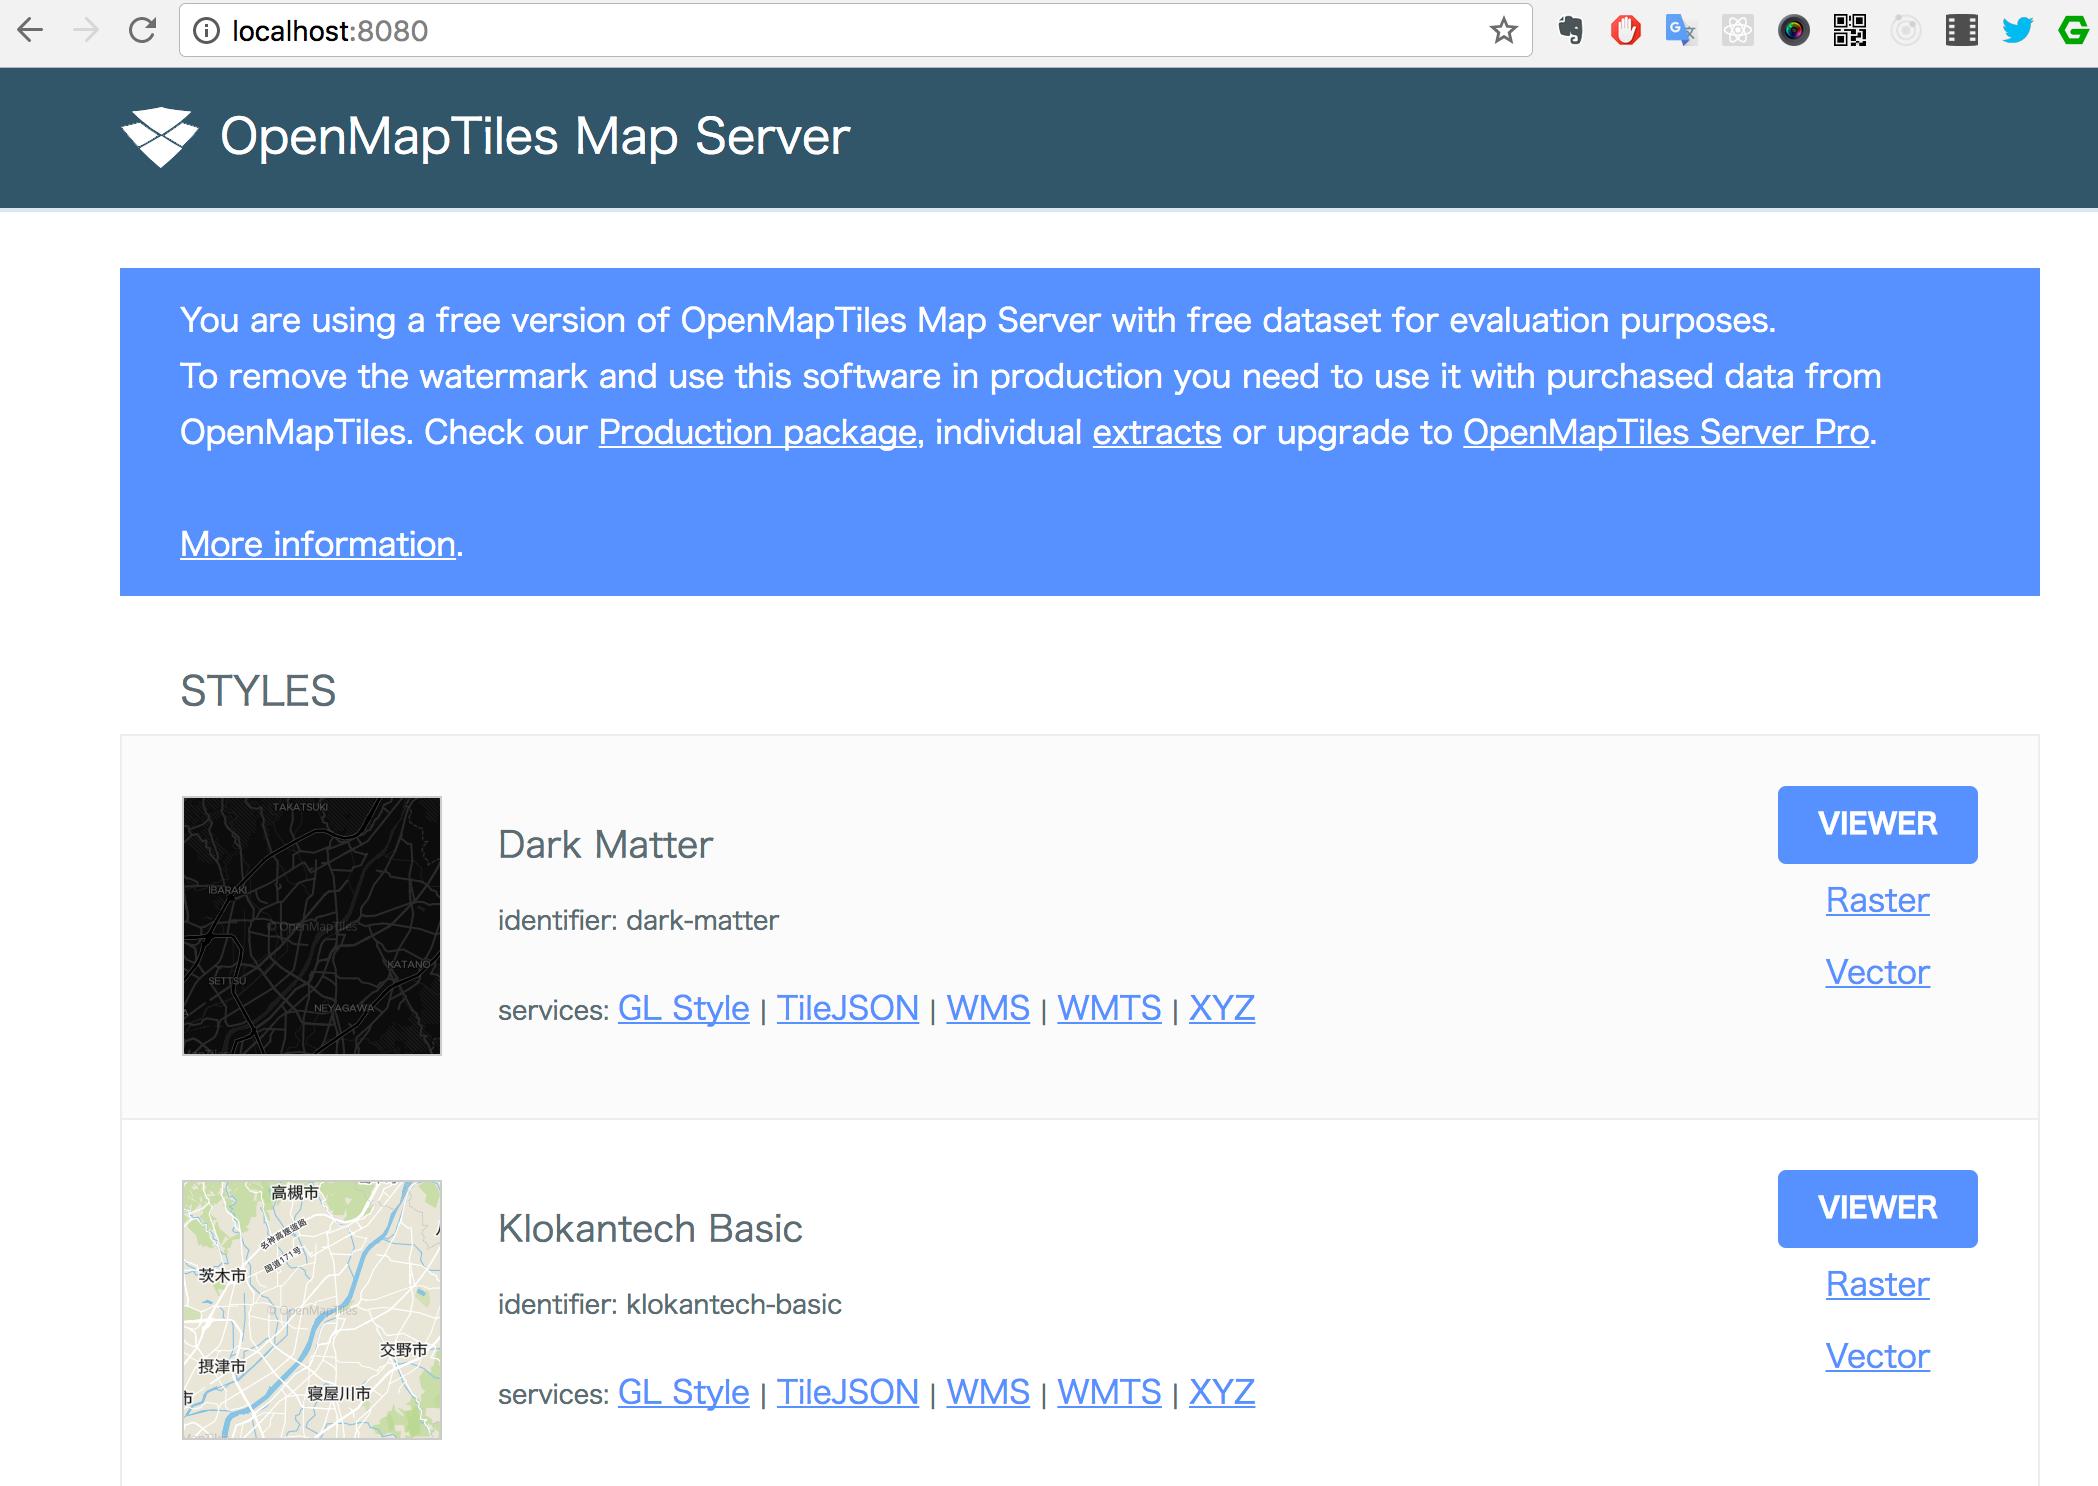 OpenMapTiles_Map_Server.png